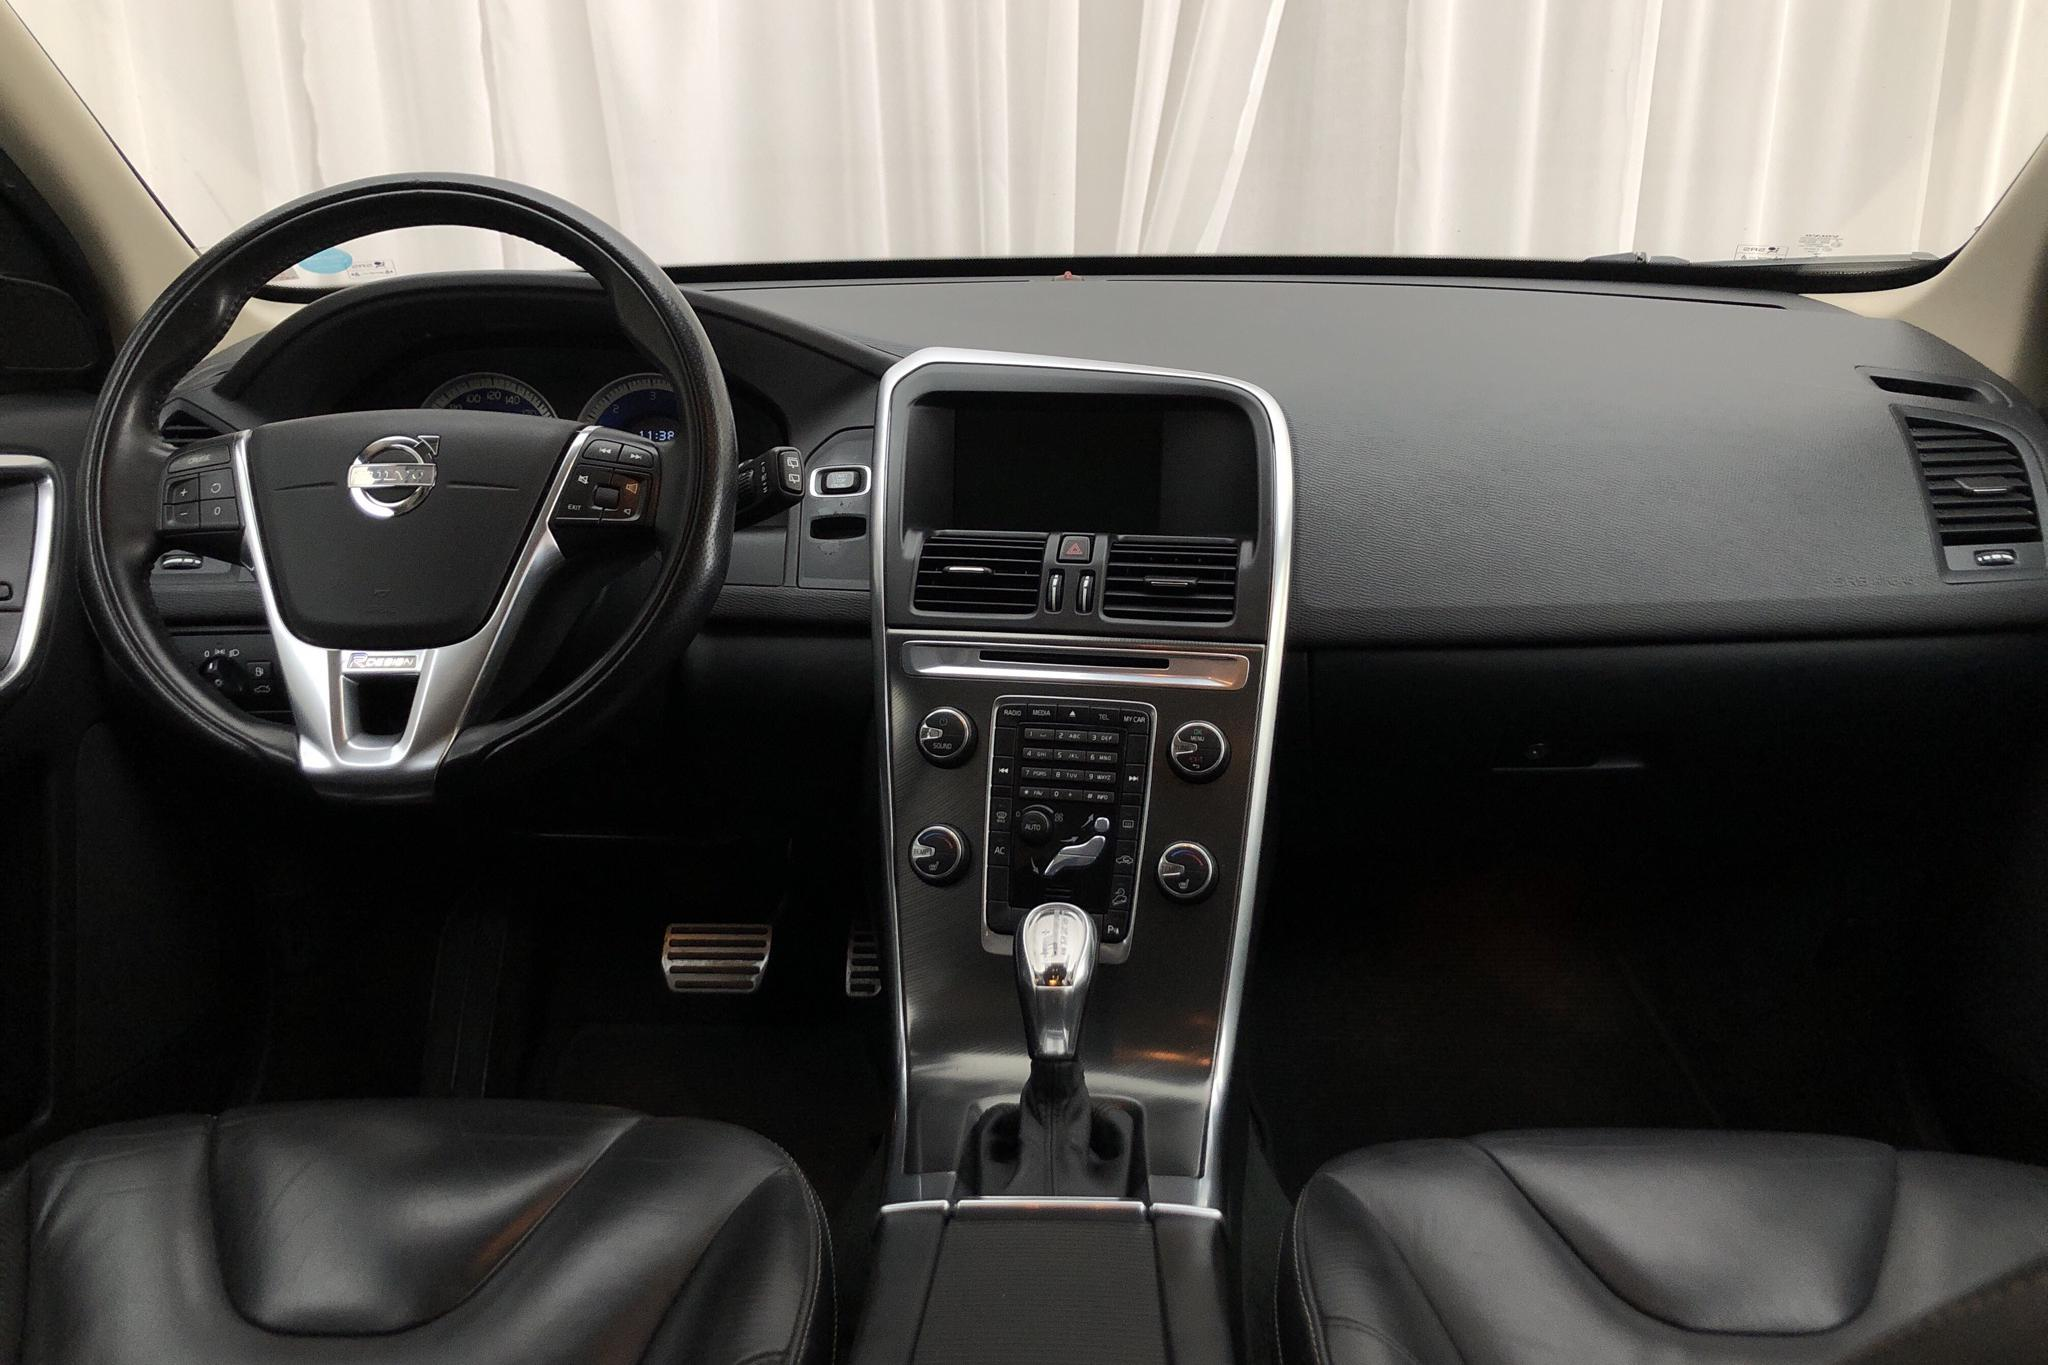 Volvo XC60 D4 AWD (163hk) - 216 690 km - Automatic - black - 2013